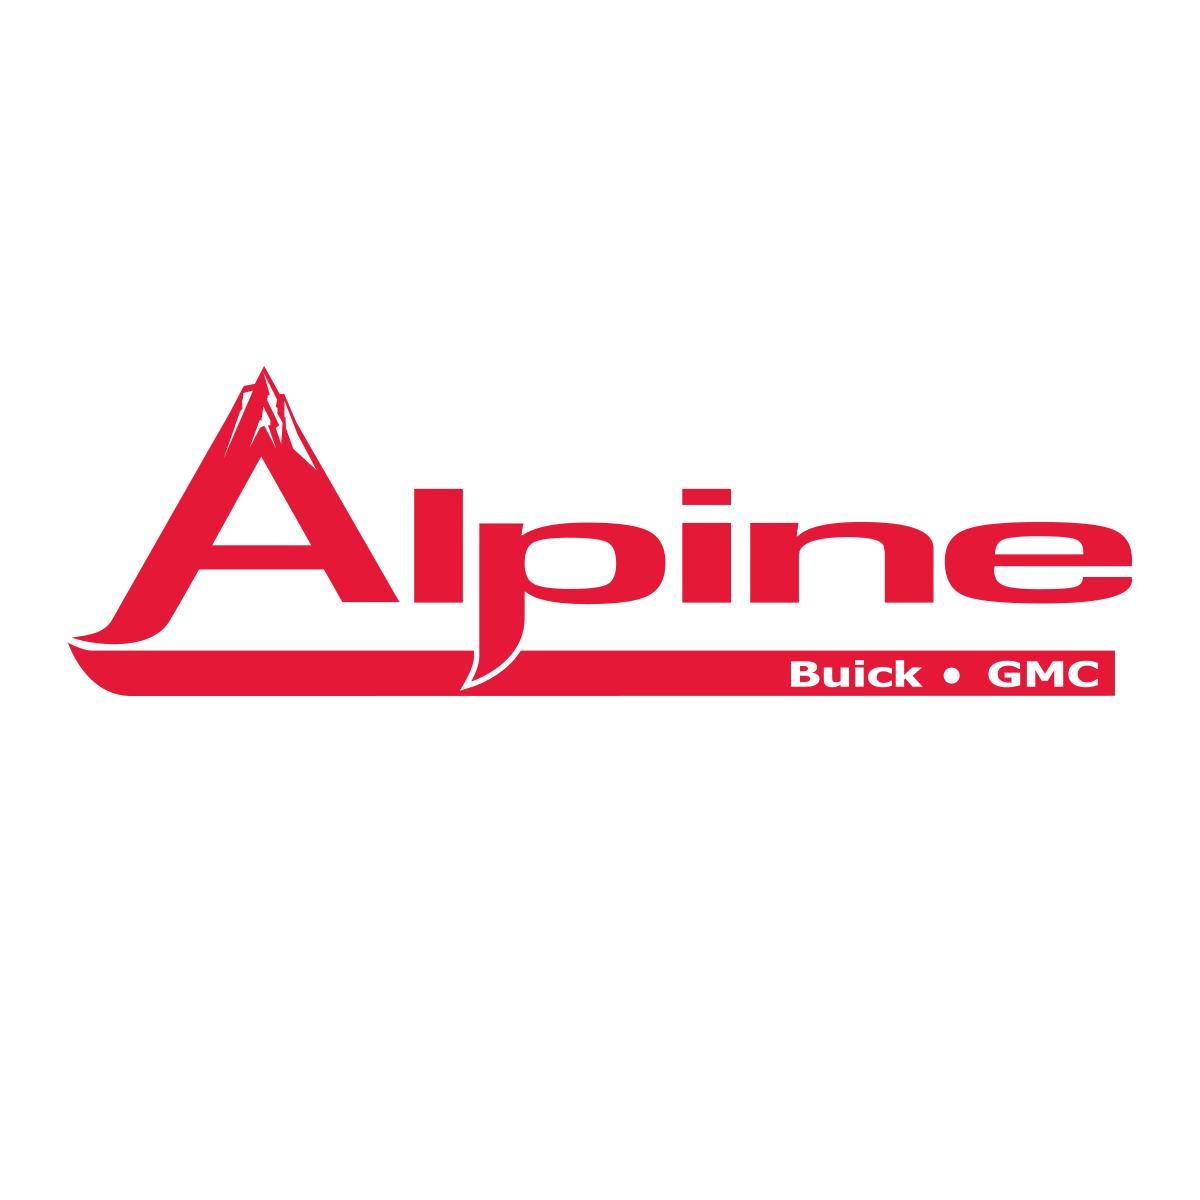 Alpine Buick GMC